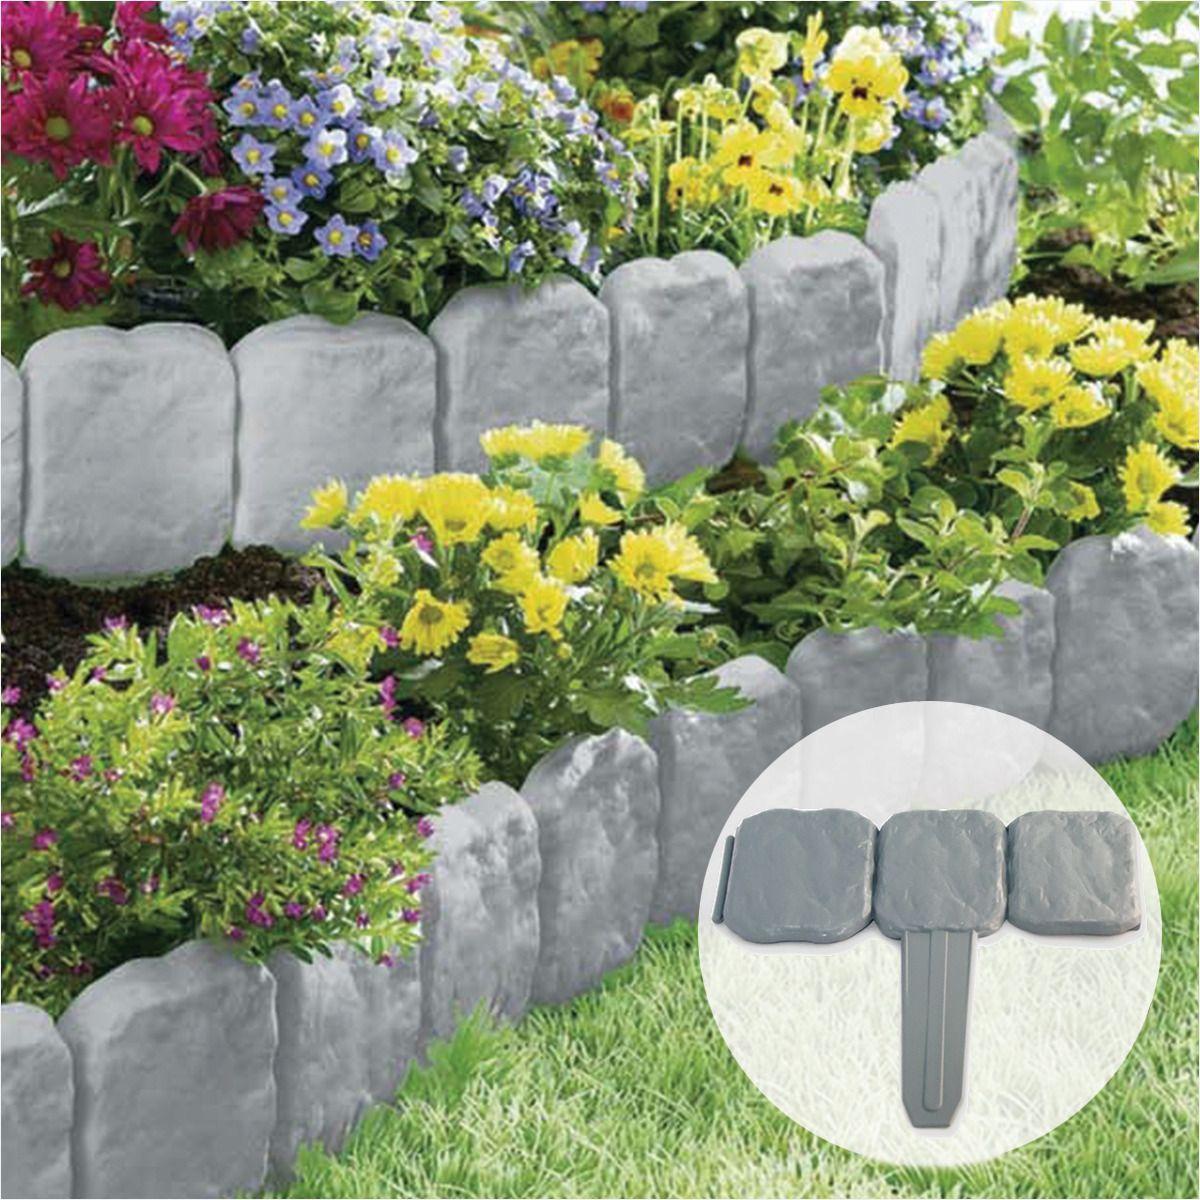 Grey Stone Slab Effect Garden Border Plastic Edging Flower Primary Garden Flower Bed Edging Ju68669 Fast 53 In 2020 Garden Edging Garden Flower Beds Flower Bed Edging